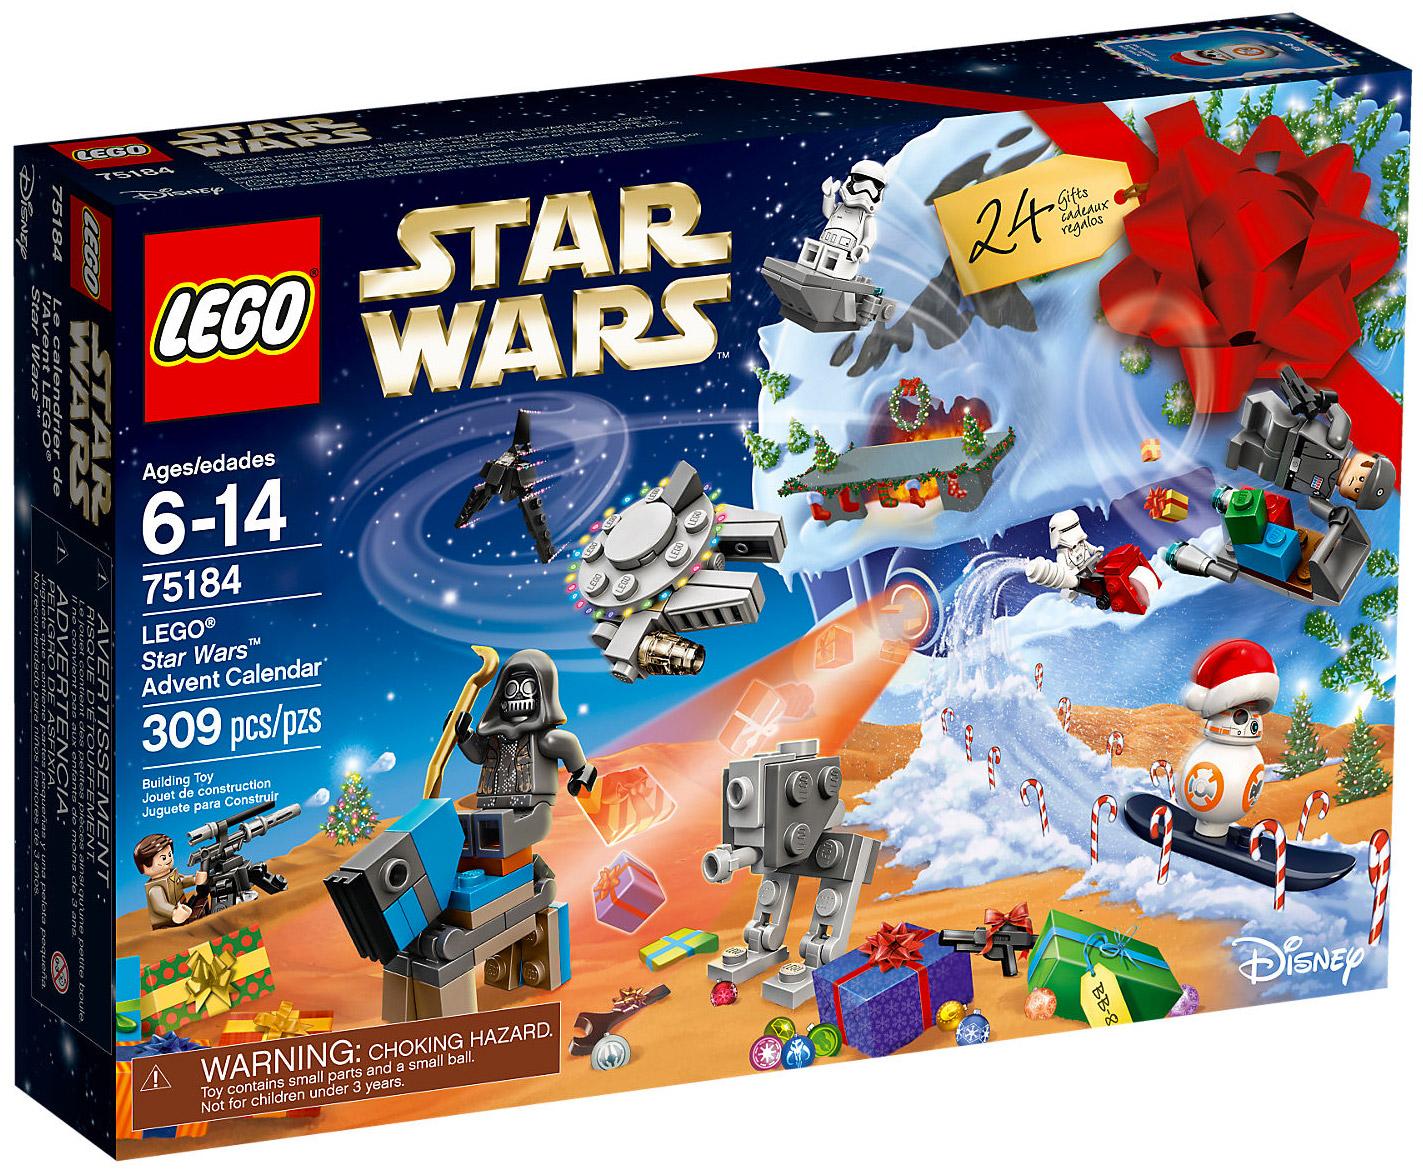 Lego star wars 75184 pas cher calendrier de l 39 avent lego - Bd lego star wars ...